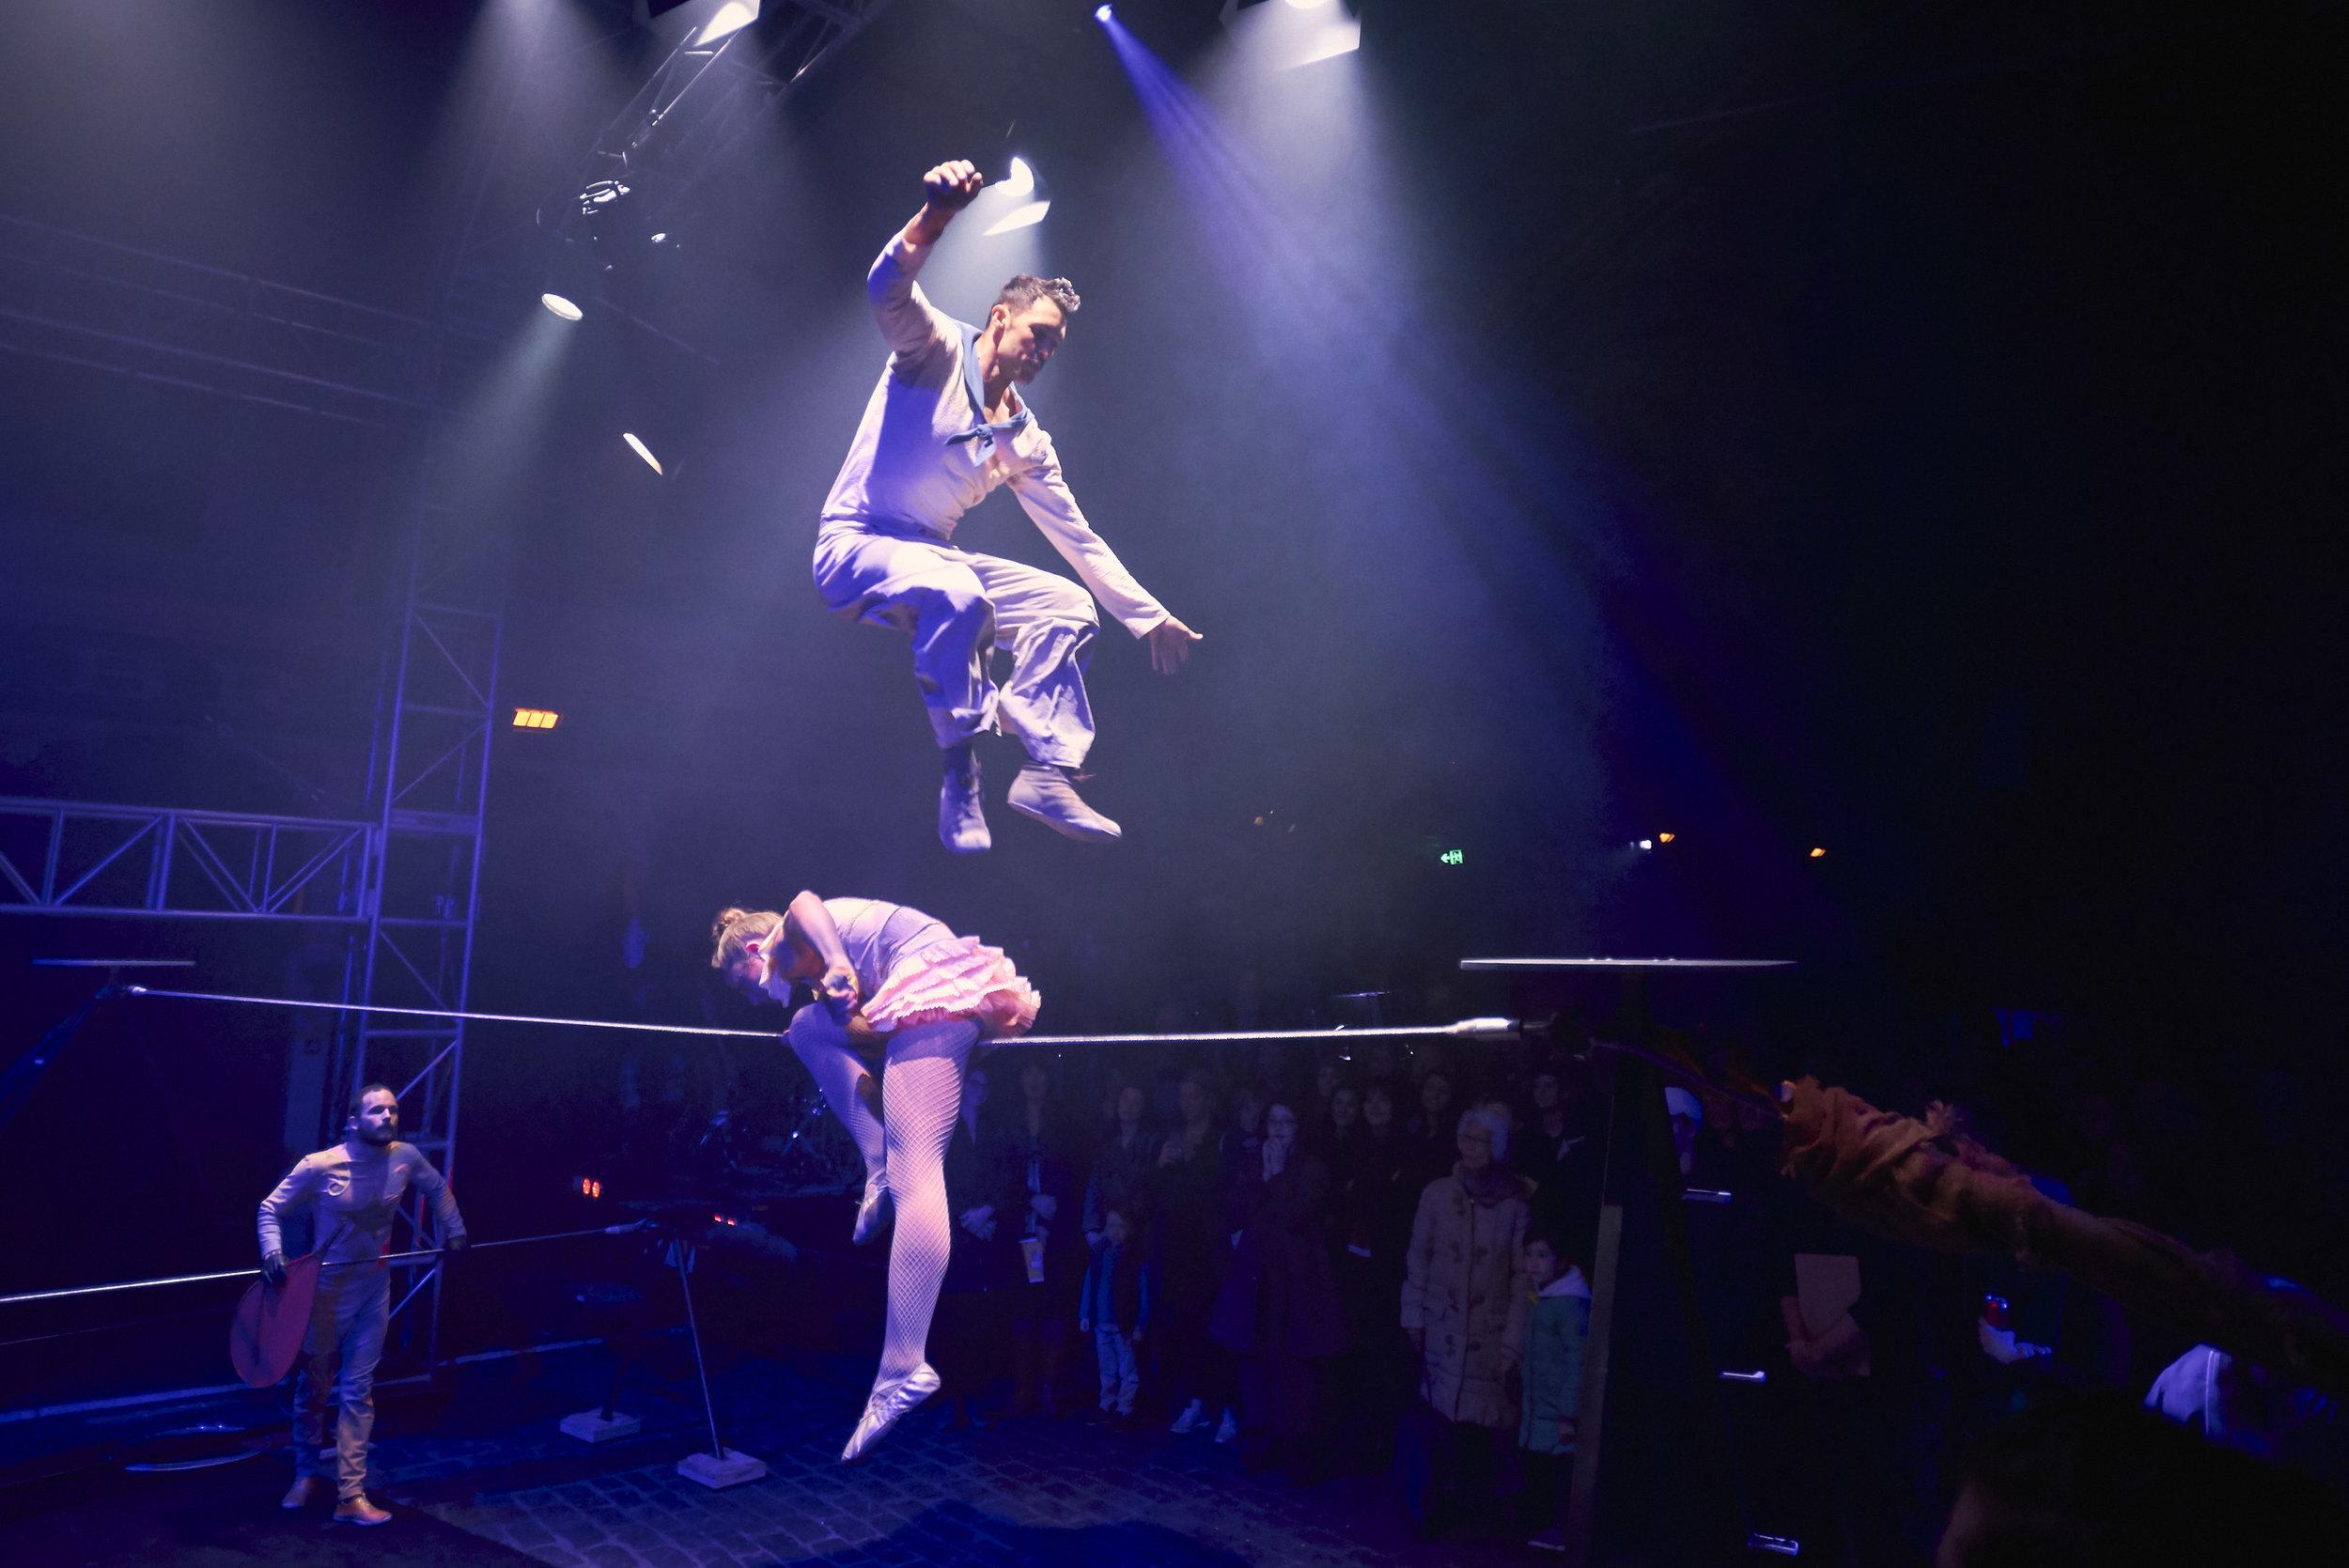 CircusOz2019_Wunderage_DylanSingh_JessMcCrindle_LachyShelley_PhotographyAaronWalker021.jpg